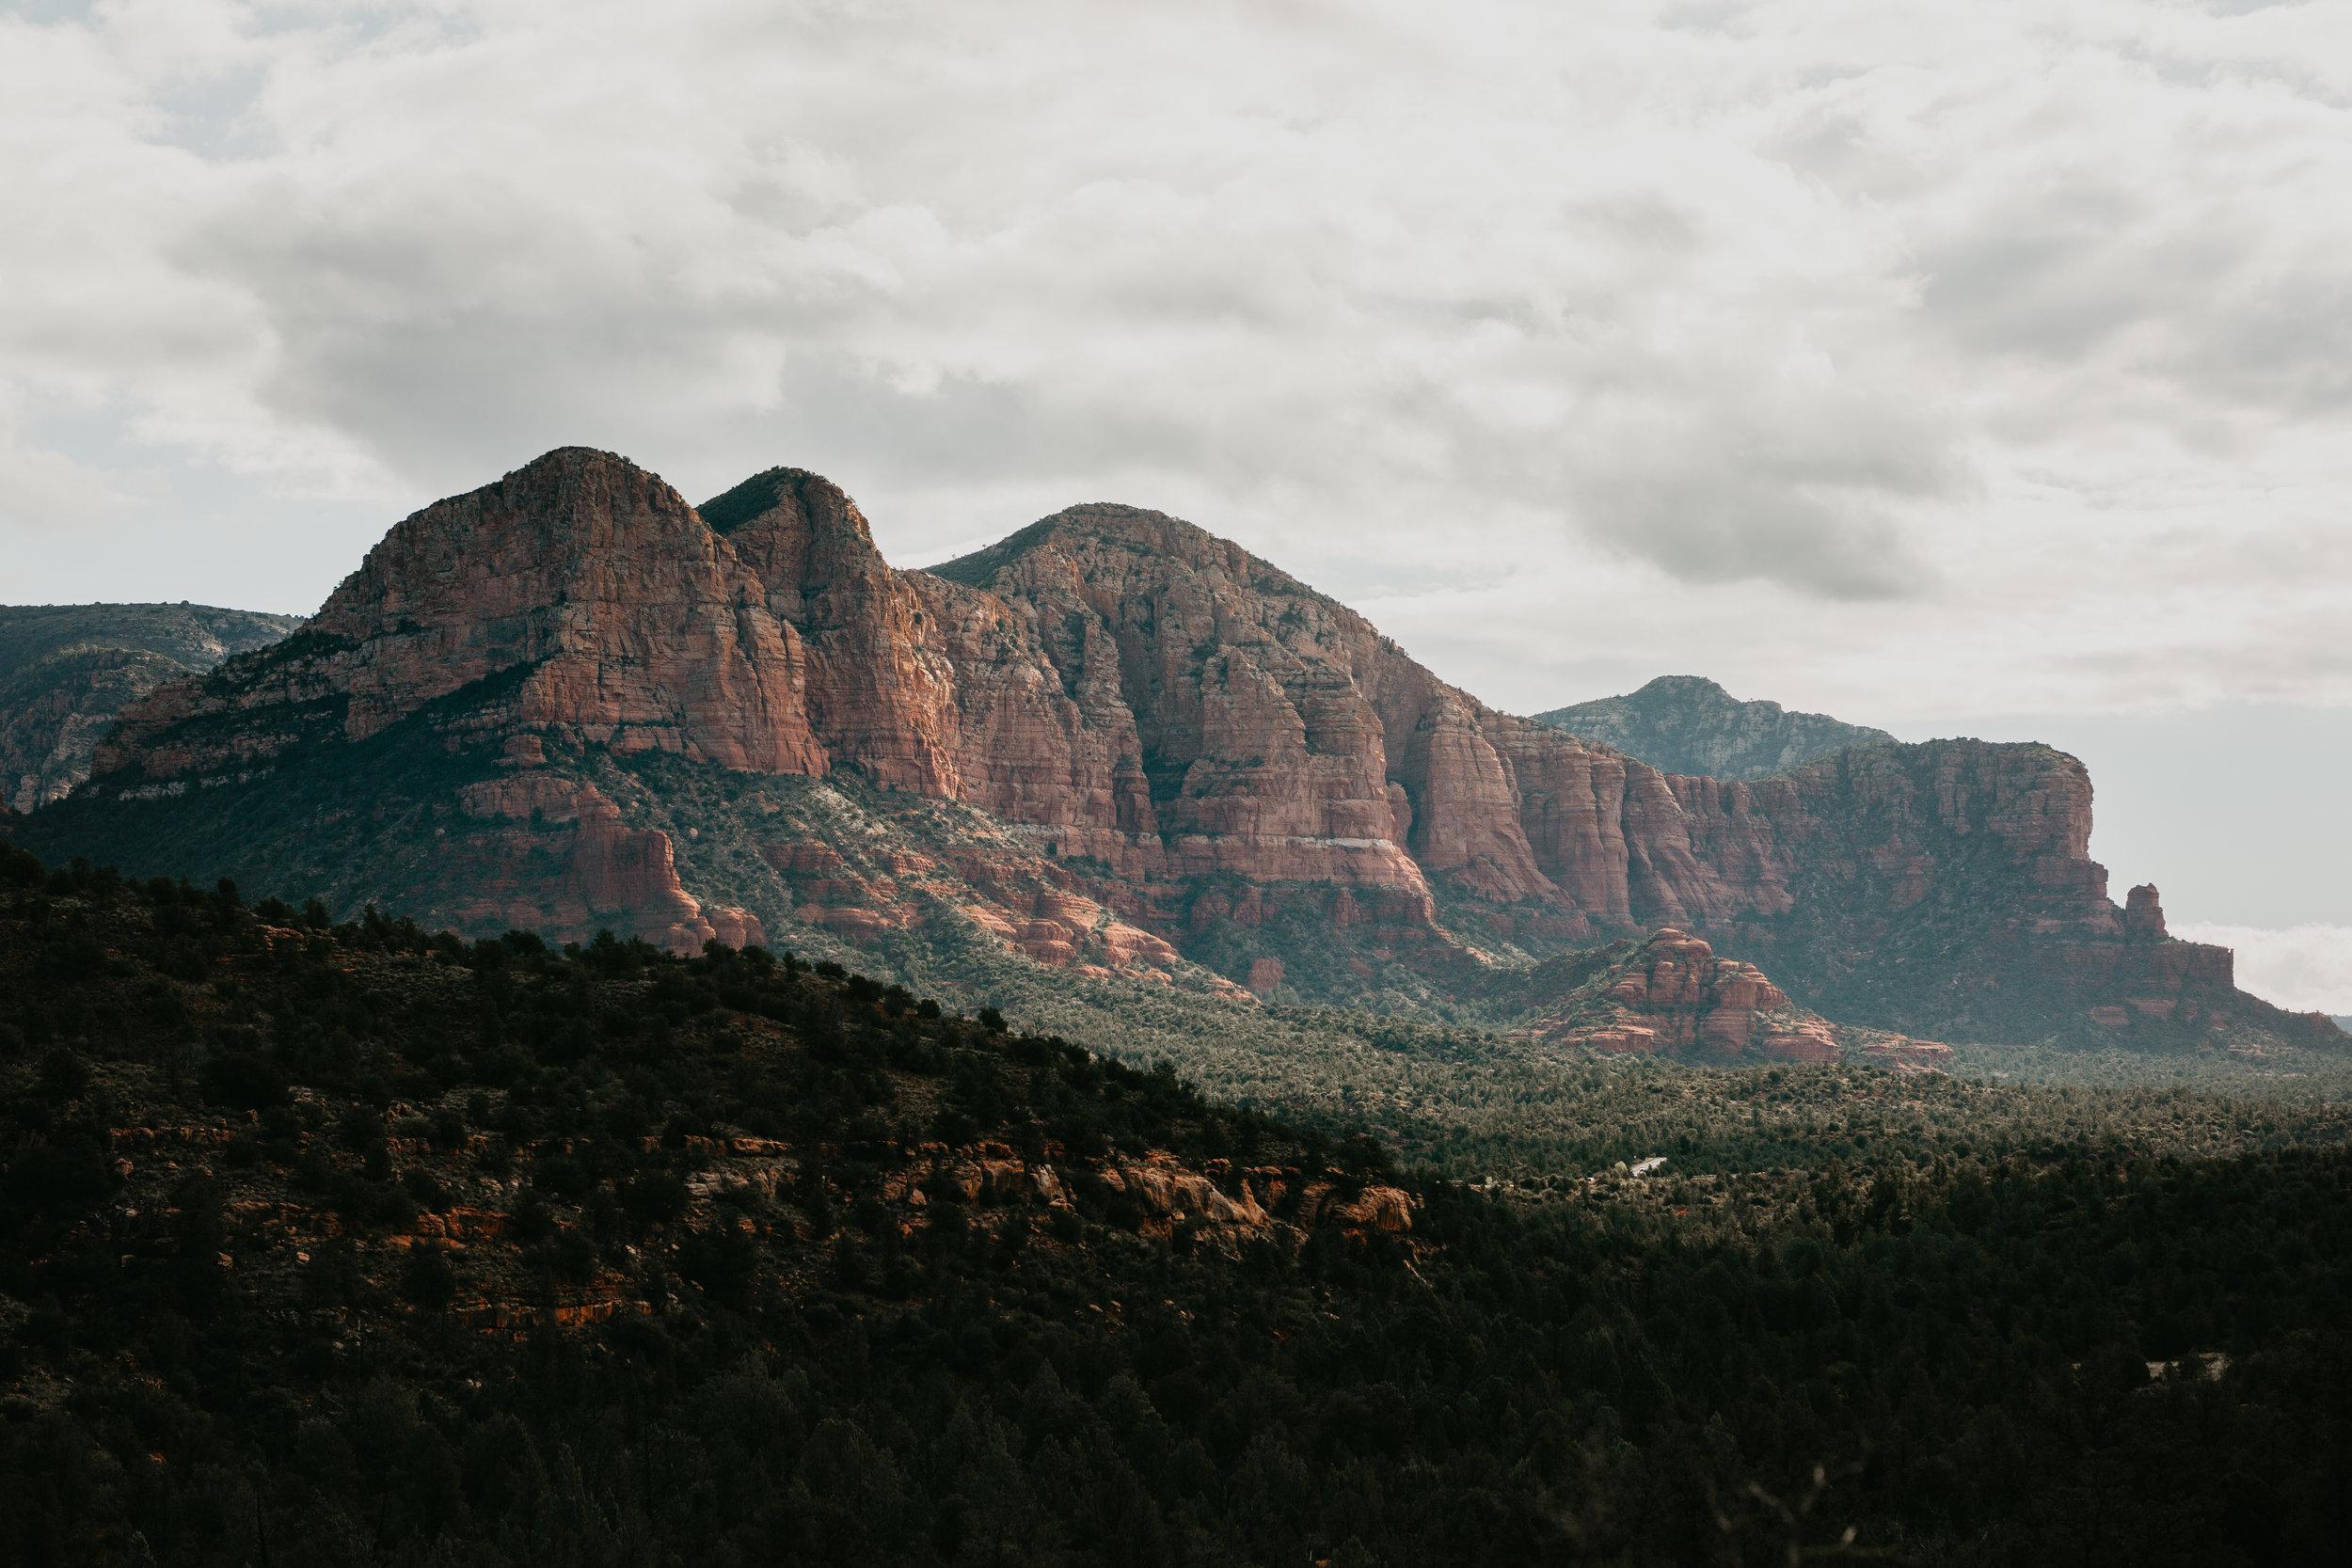 nicole-daacke-photography-sedona-arizona-destination-elopement-wedding-photographer-catherdral-rock-hiking-elopement-sedona-river-elopement-photos-desert-rock-wedding-photographer-laid-back-spontaneous-elopement-76.jpg